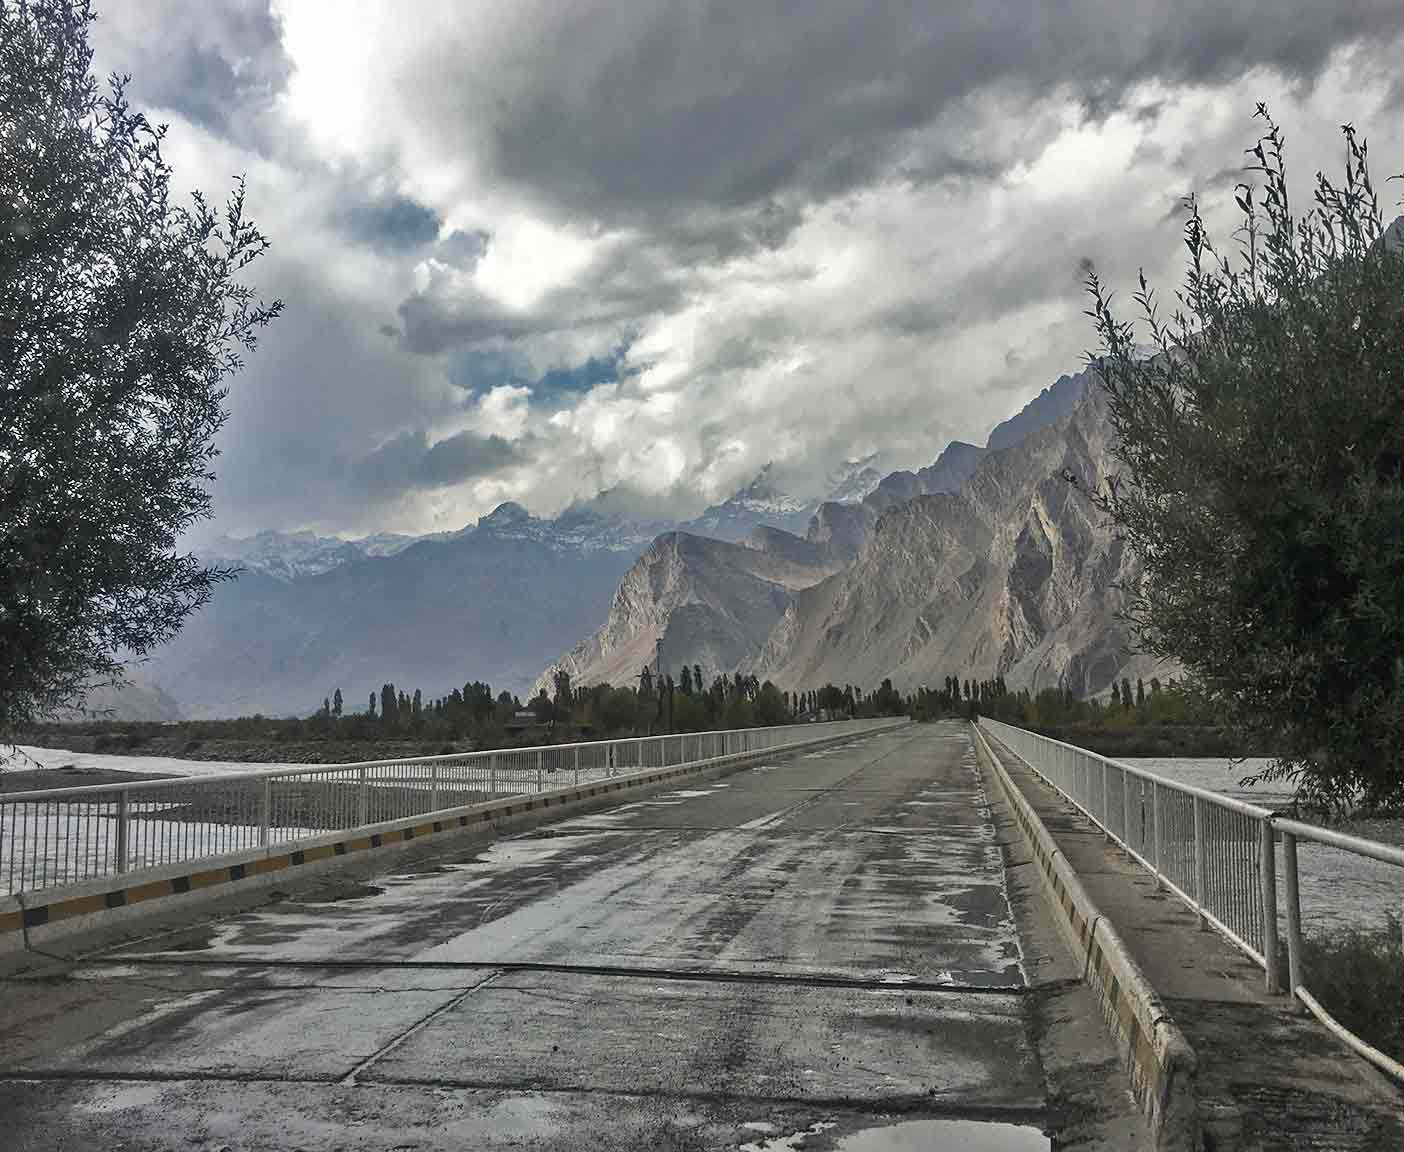 pamir-highway-m41-motorrad-auto-wohnmobil-camper-laenge-kyrgyzstan-guide-2017-2018-2019-china-afghanistan-korogh-river